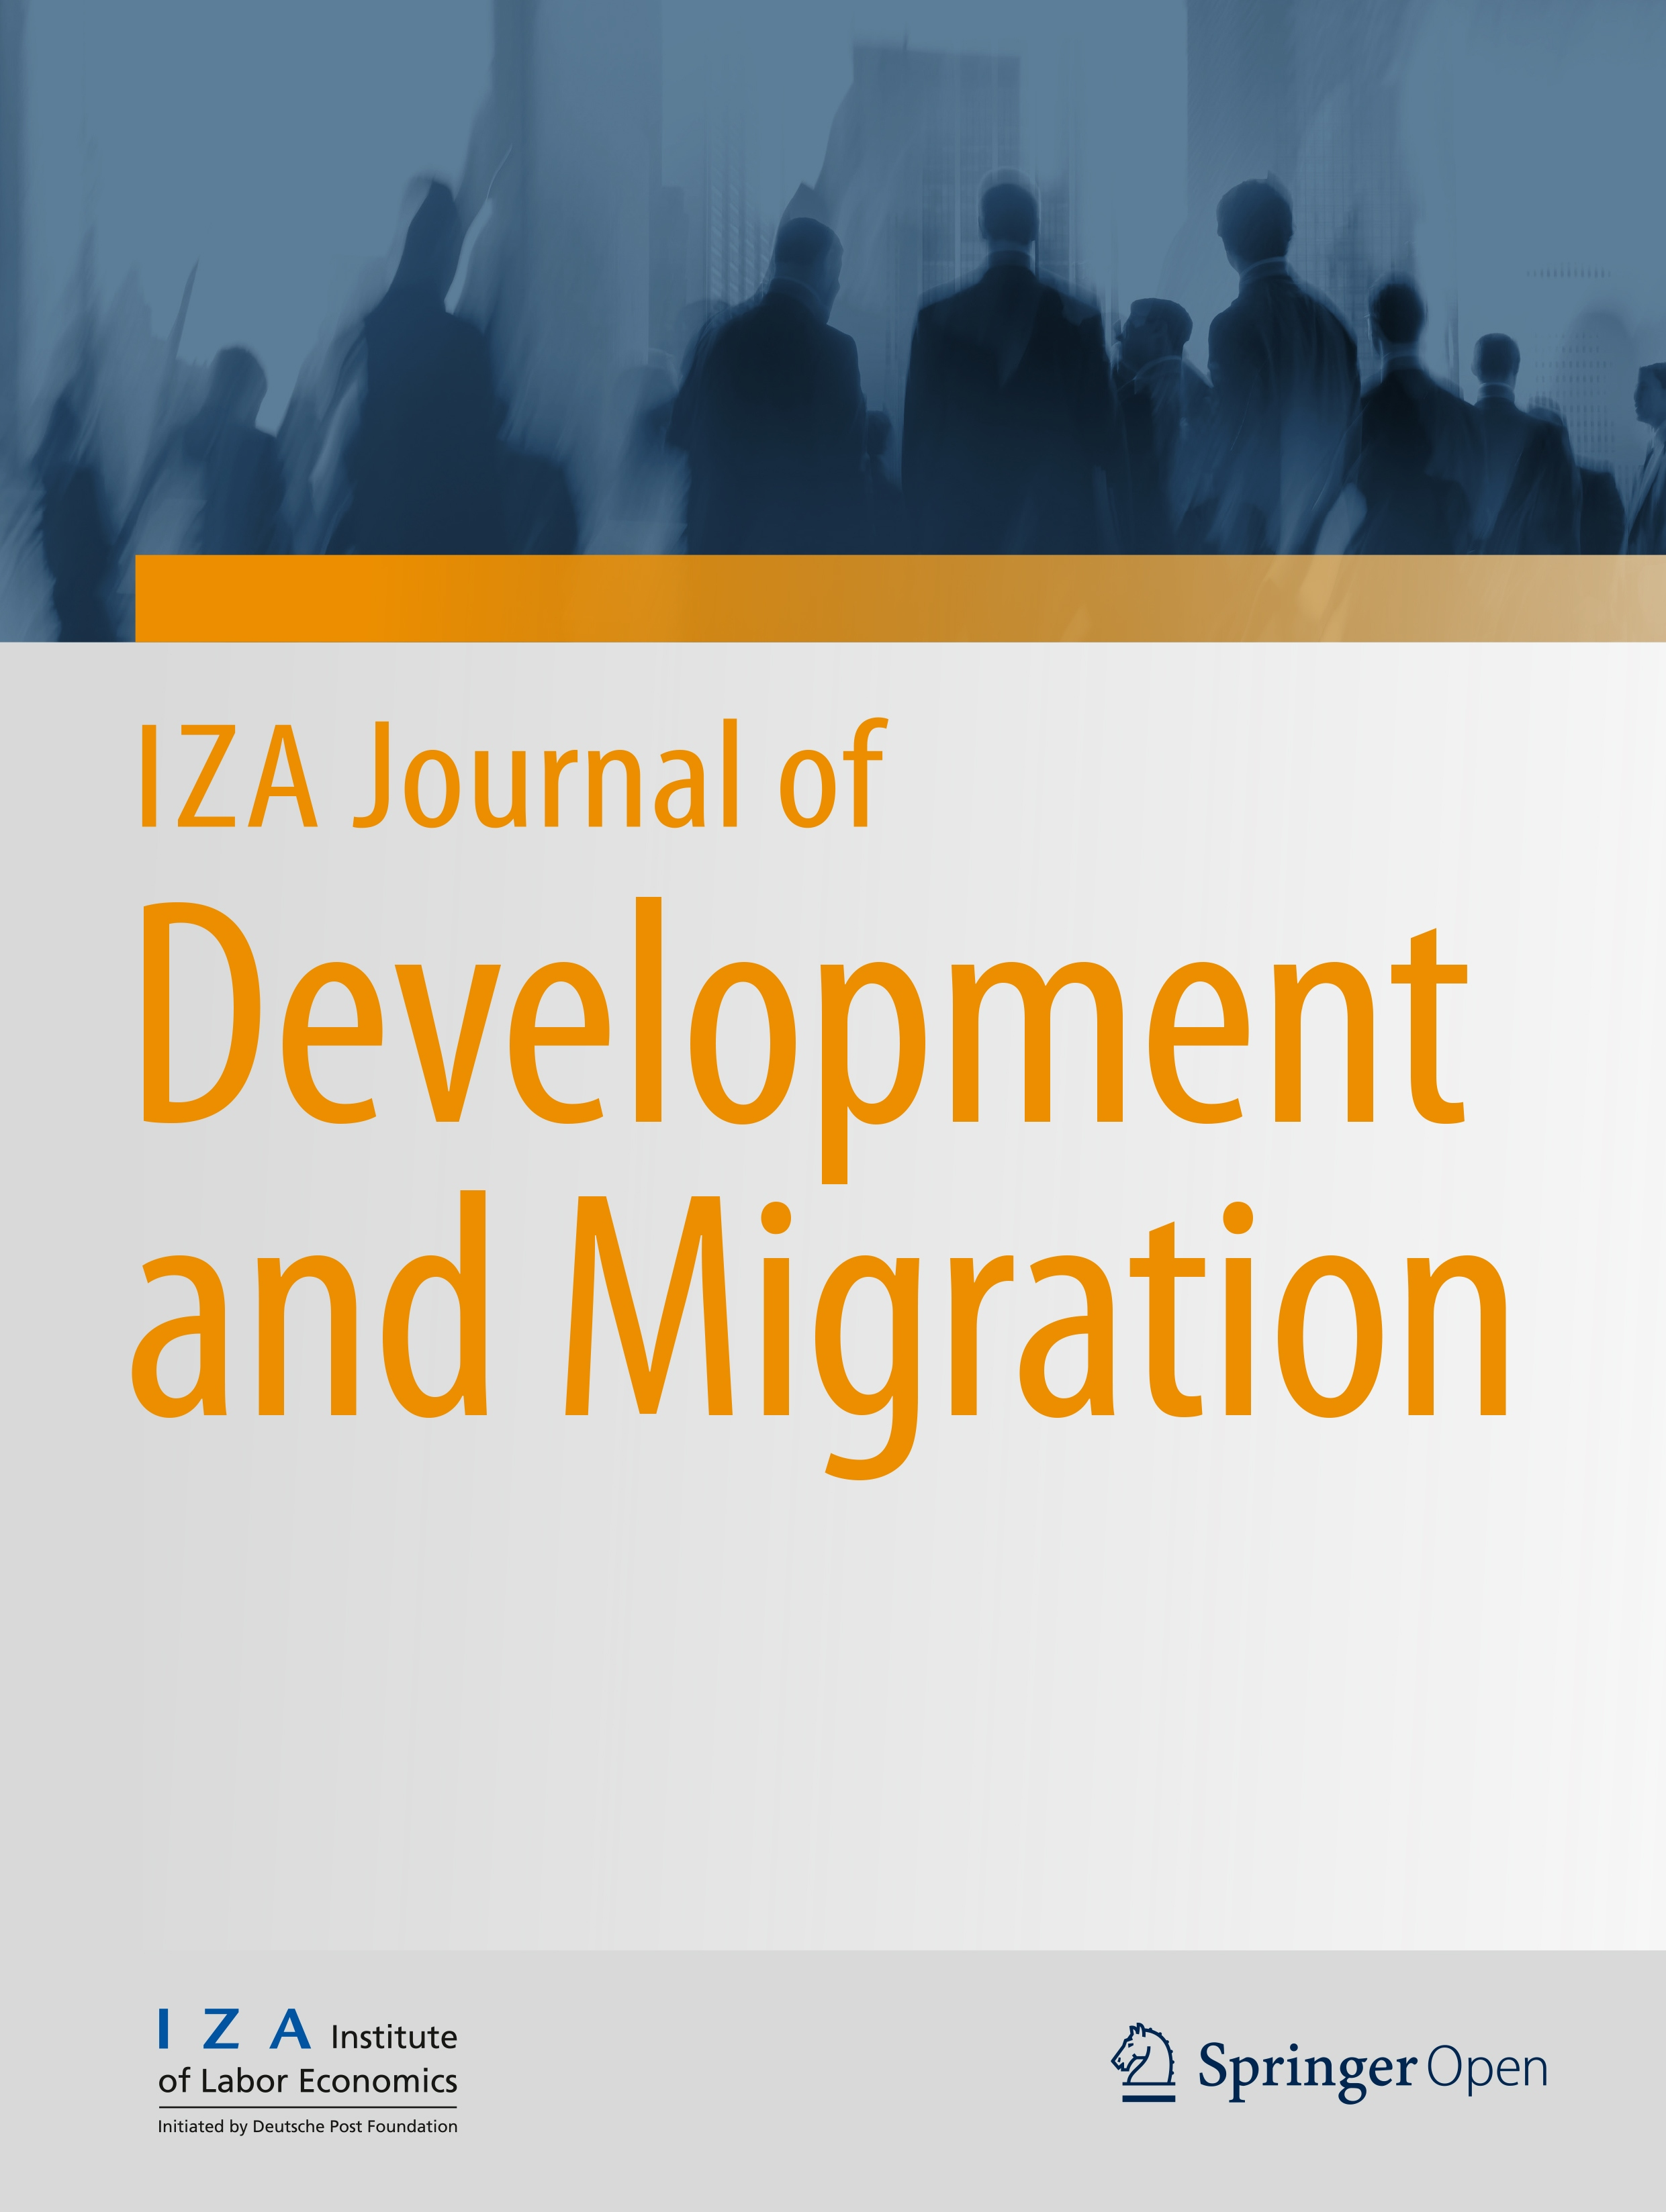 IZA Journal of Development and Migration